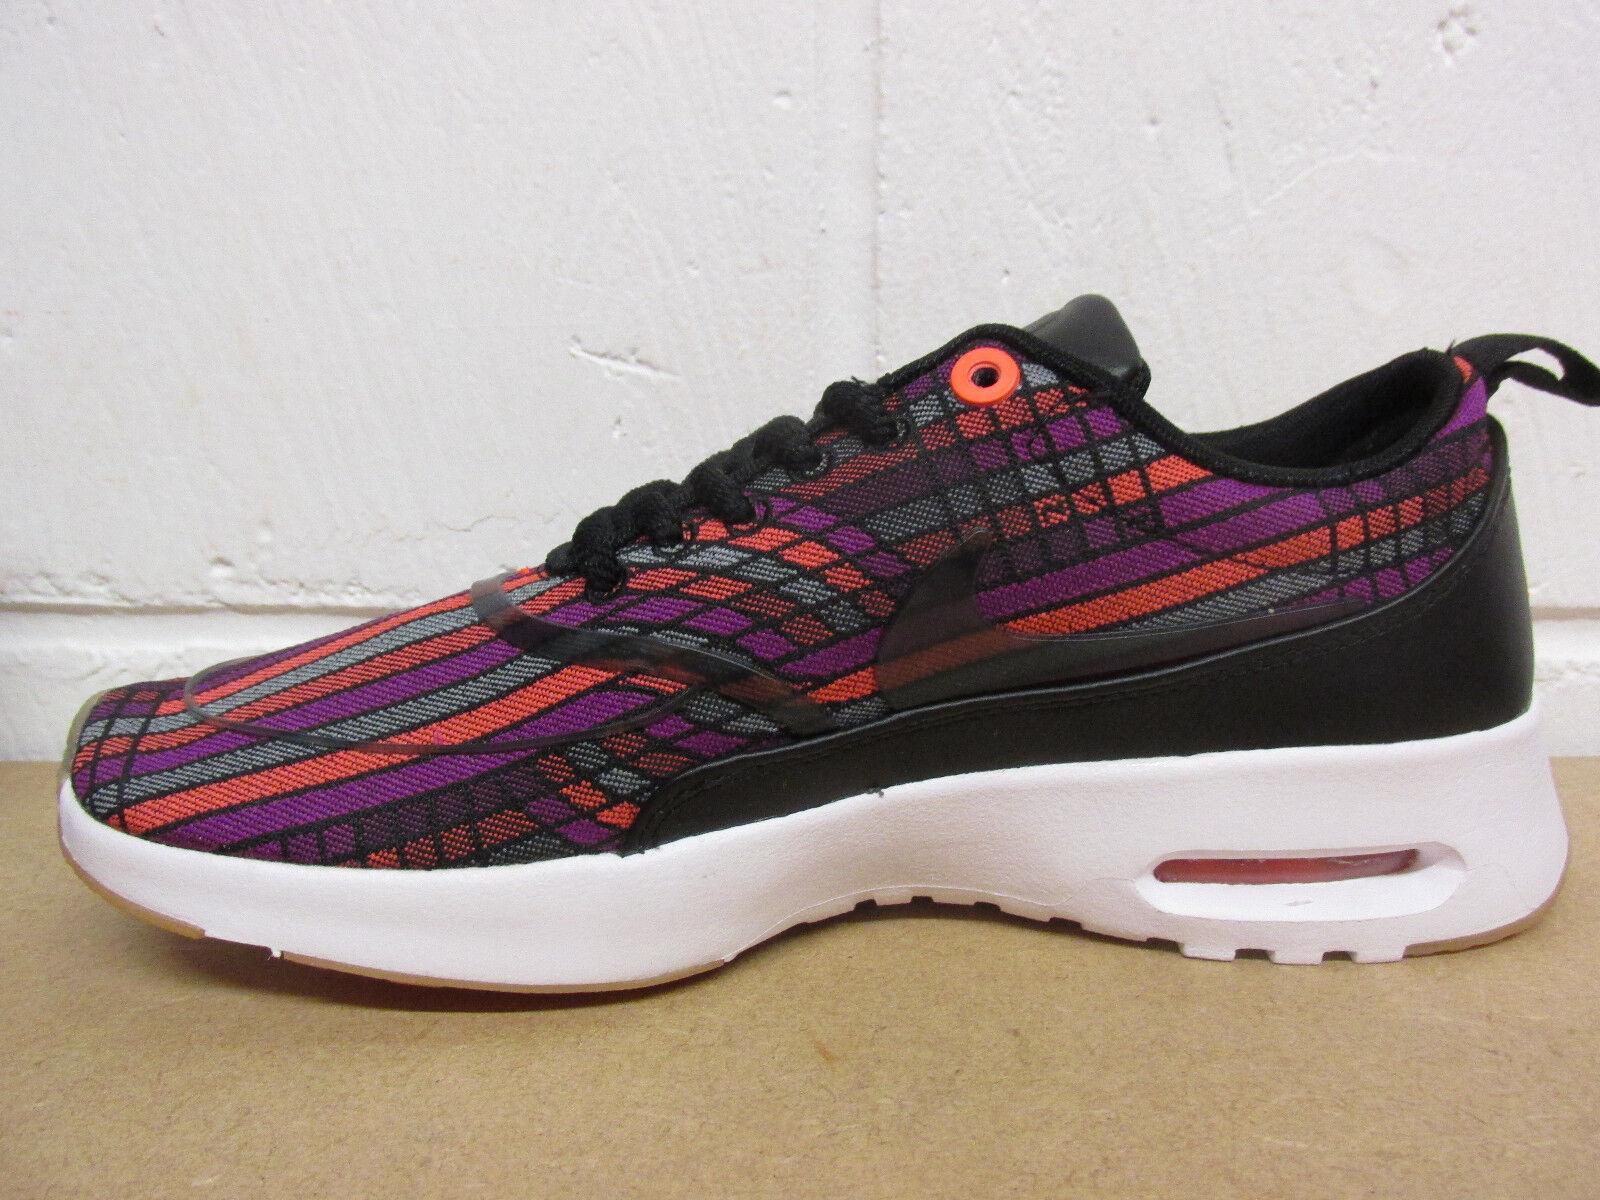 Nike JCRD Air Max Thea Ultra JCRD Nike PRM Damenschuhe Running Trainers 885021 001 Sneakers 50d055